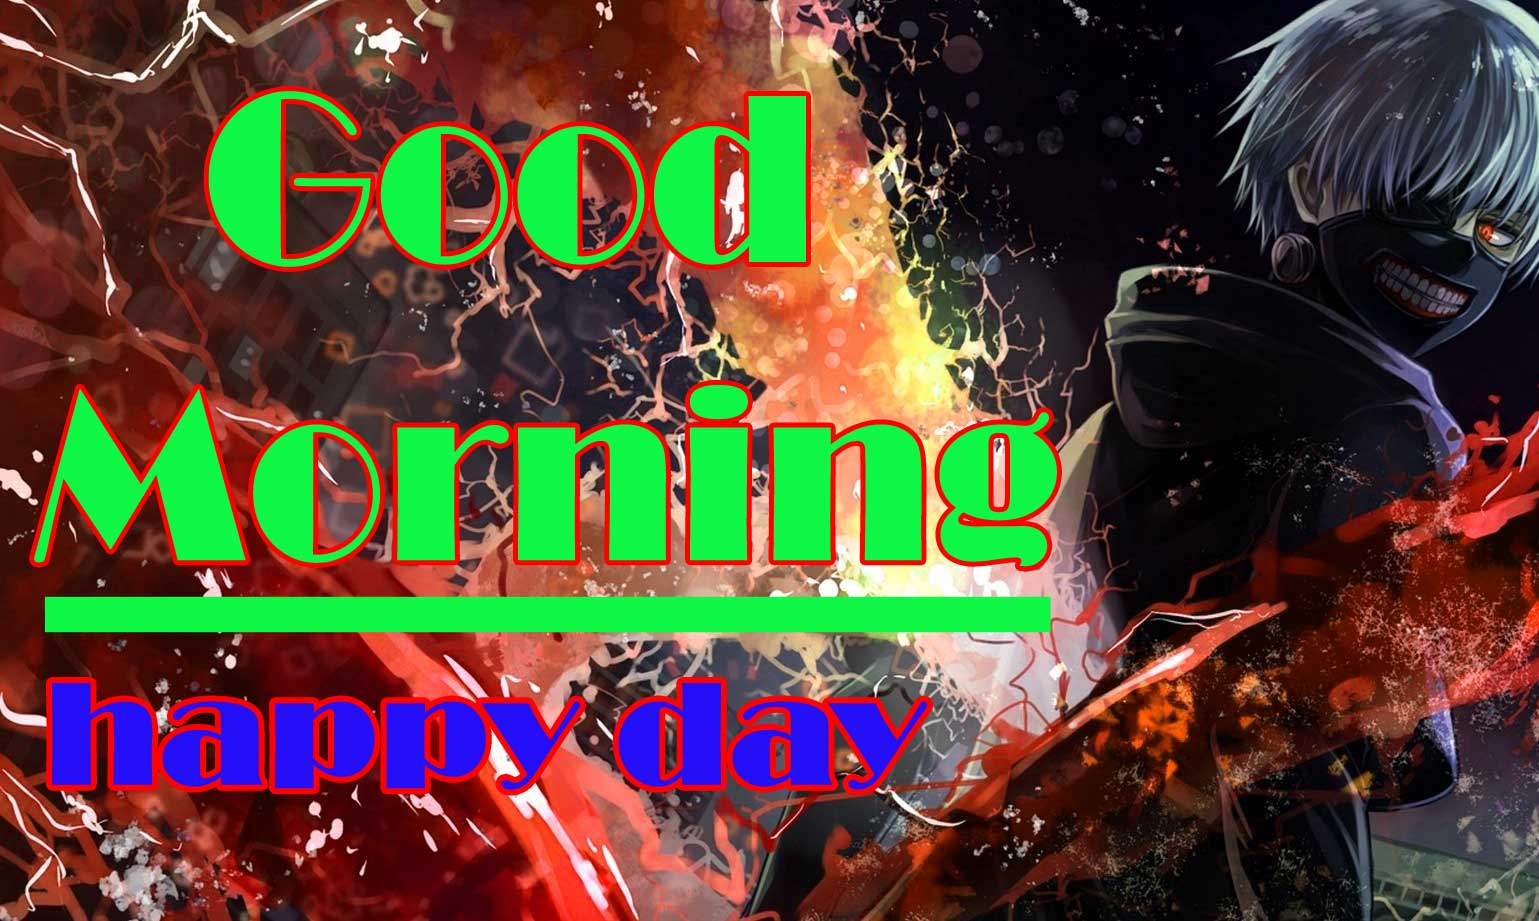 Good Morning Photo Free Download